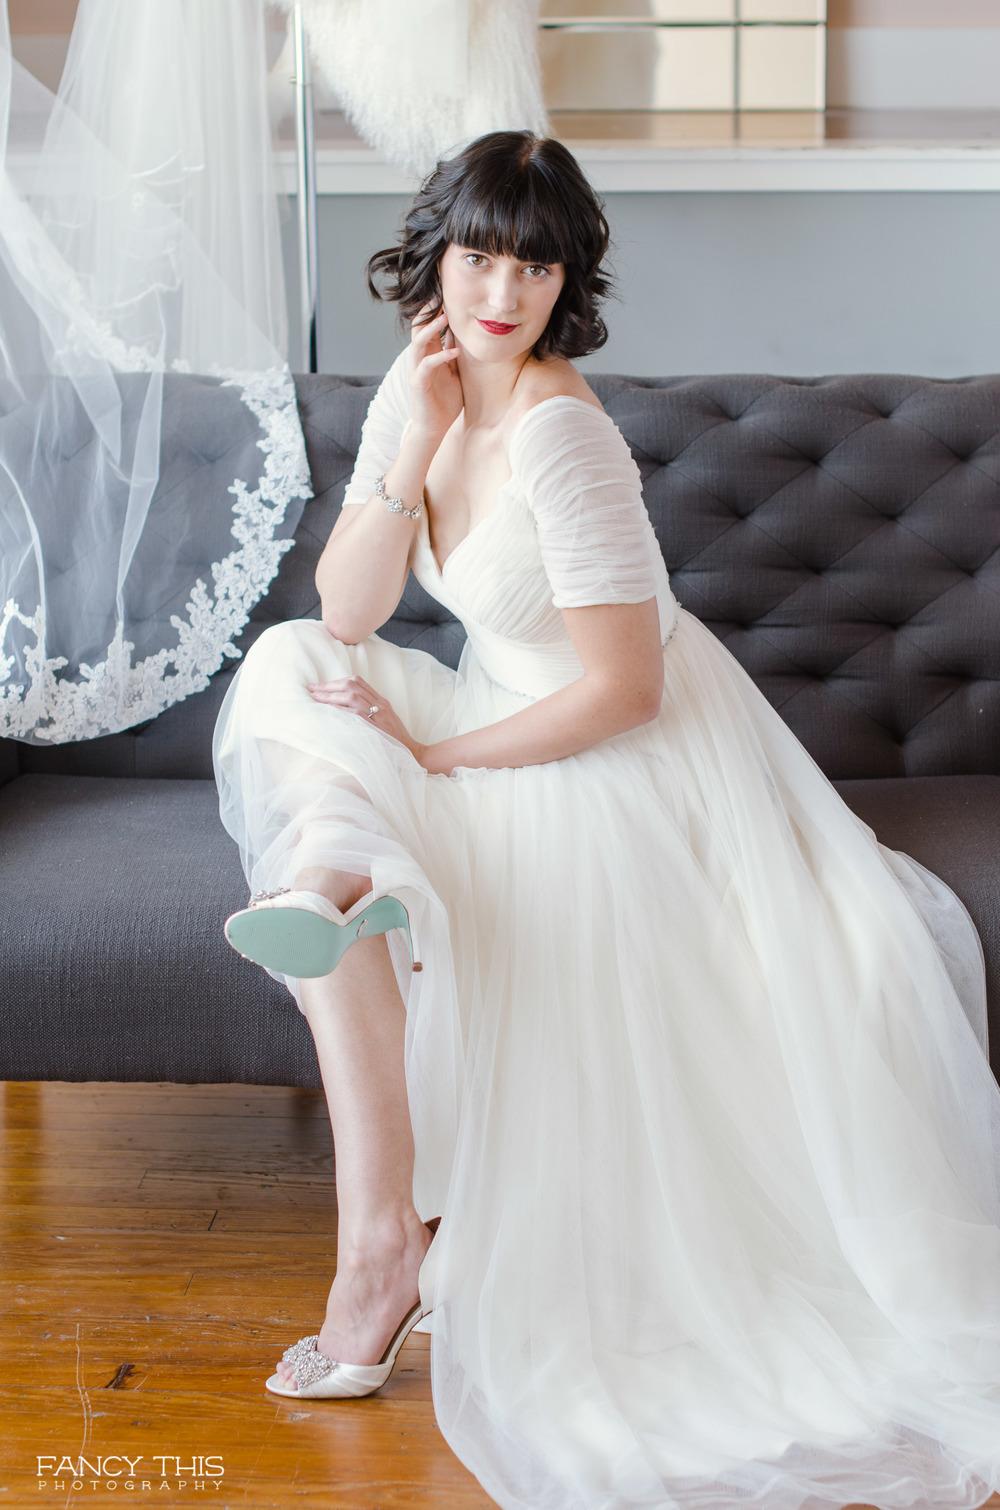 joy_bridal-31.jpg